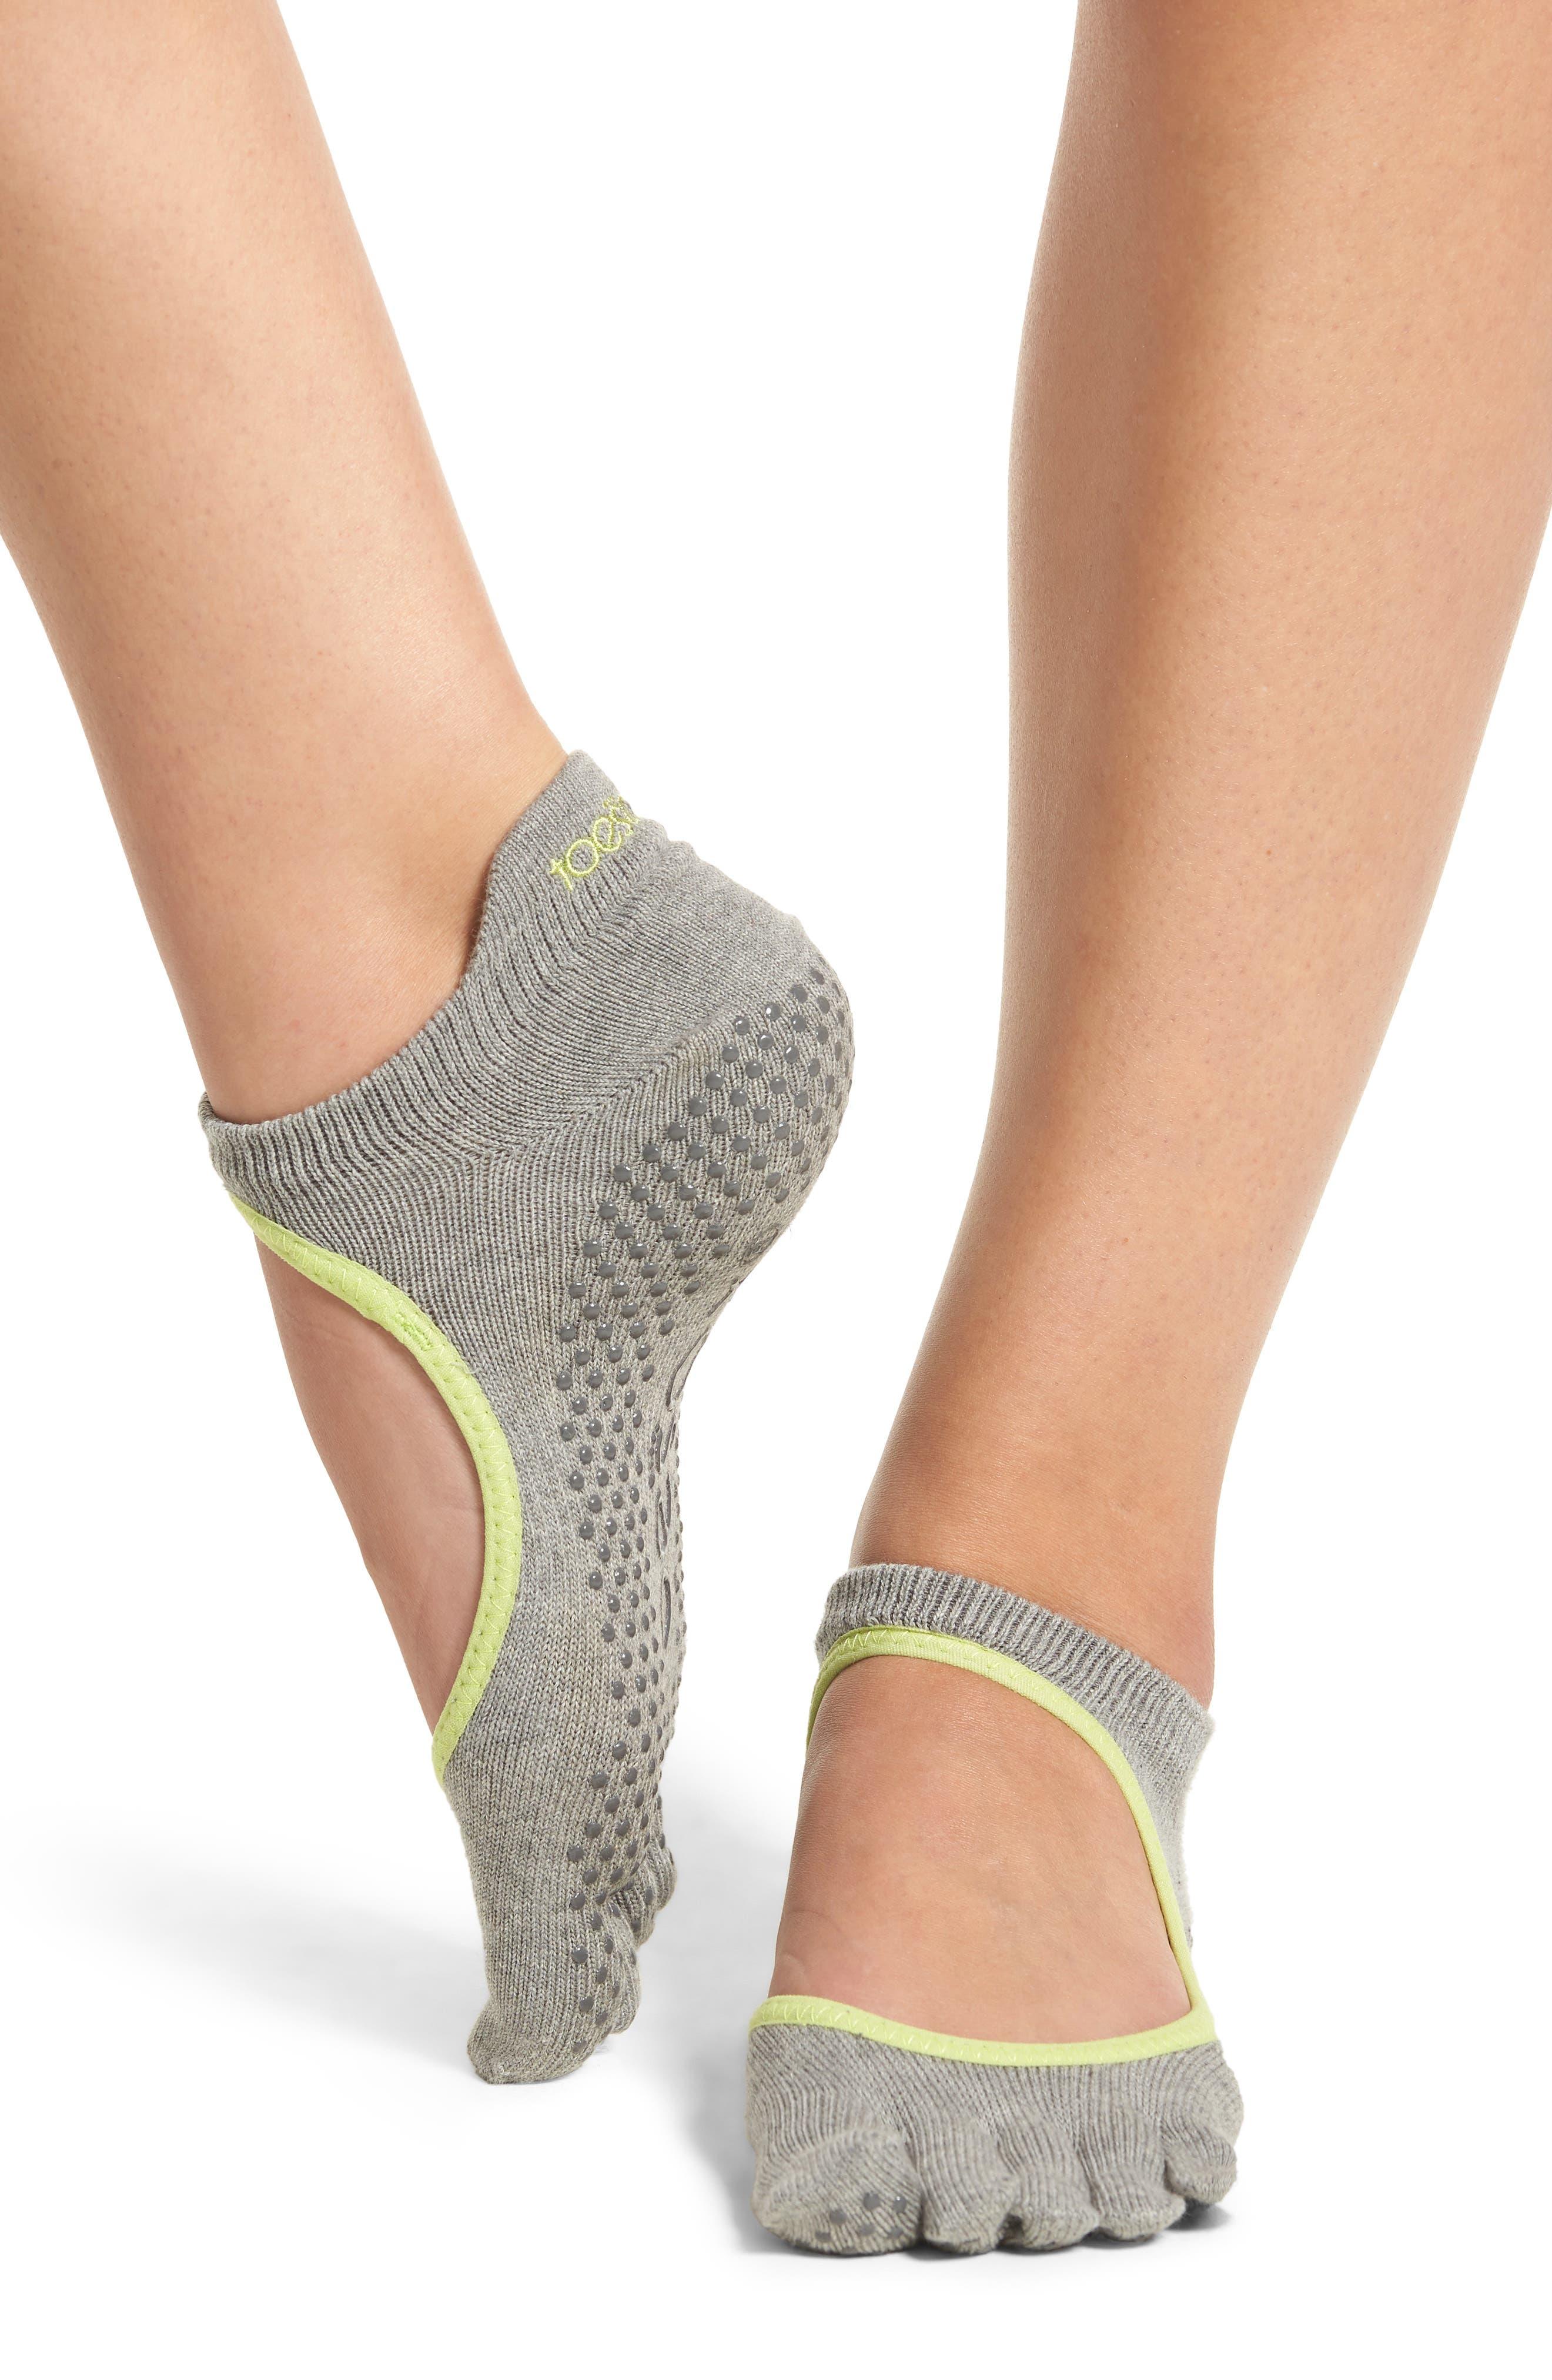 Bellarina Full Toe Gripper Socks,                             Alternate thumbnail 2, color,                             HEATHER GREY/ LIME